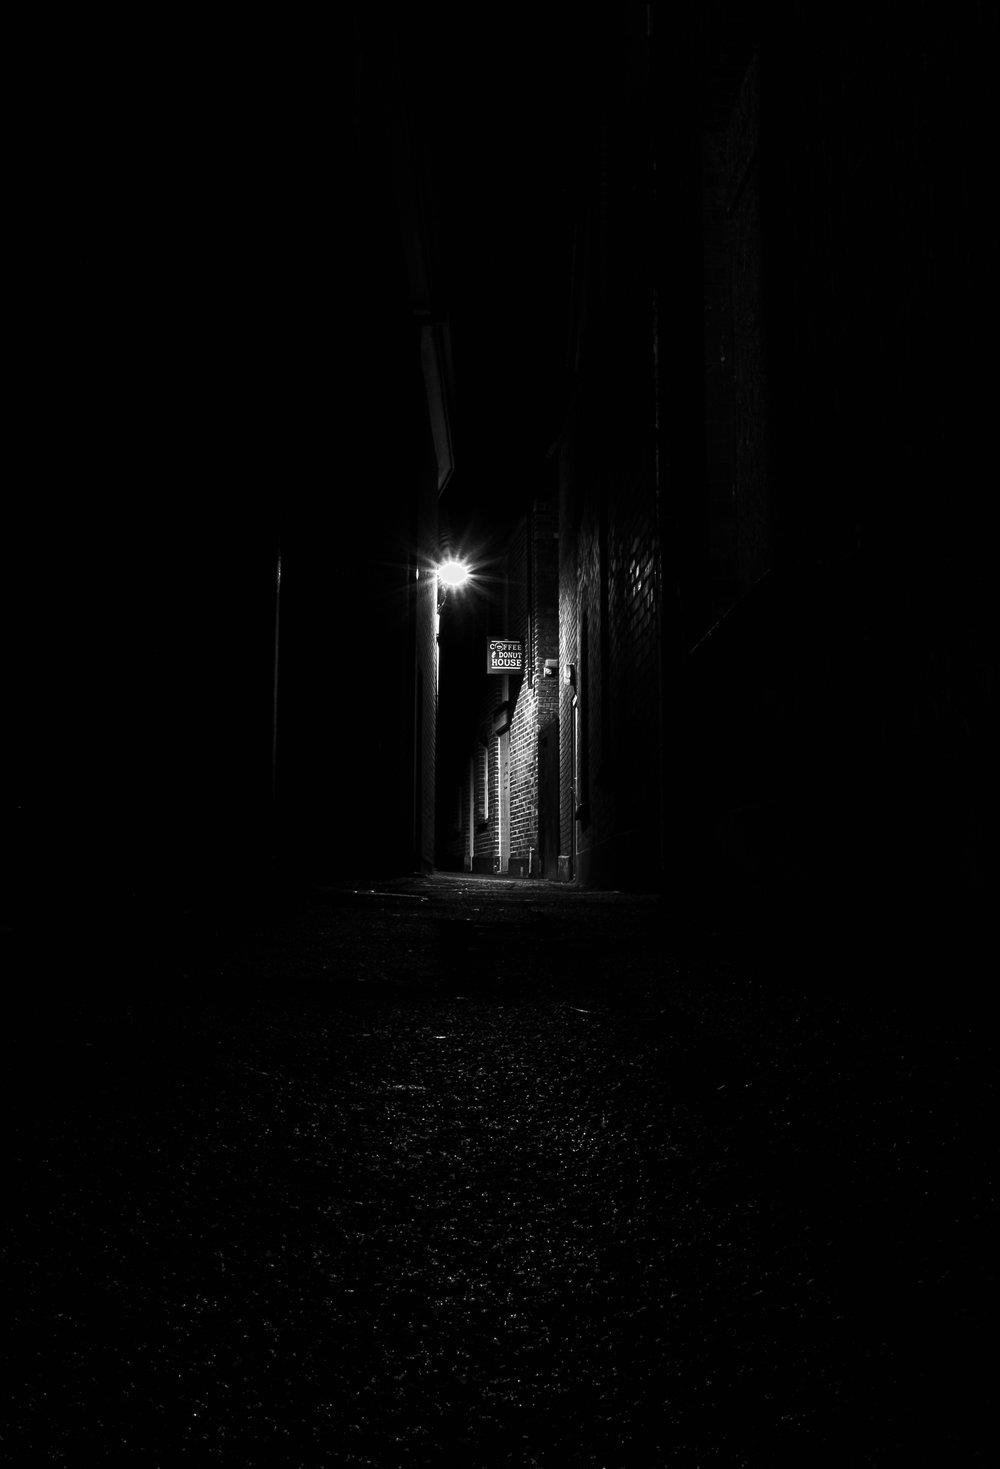 Truro side street bw dark single light.jpg